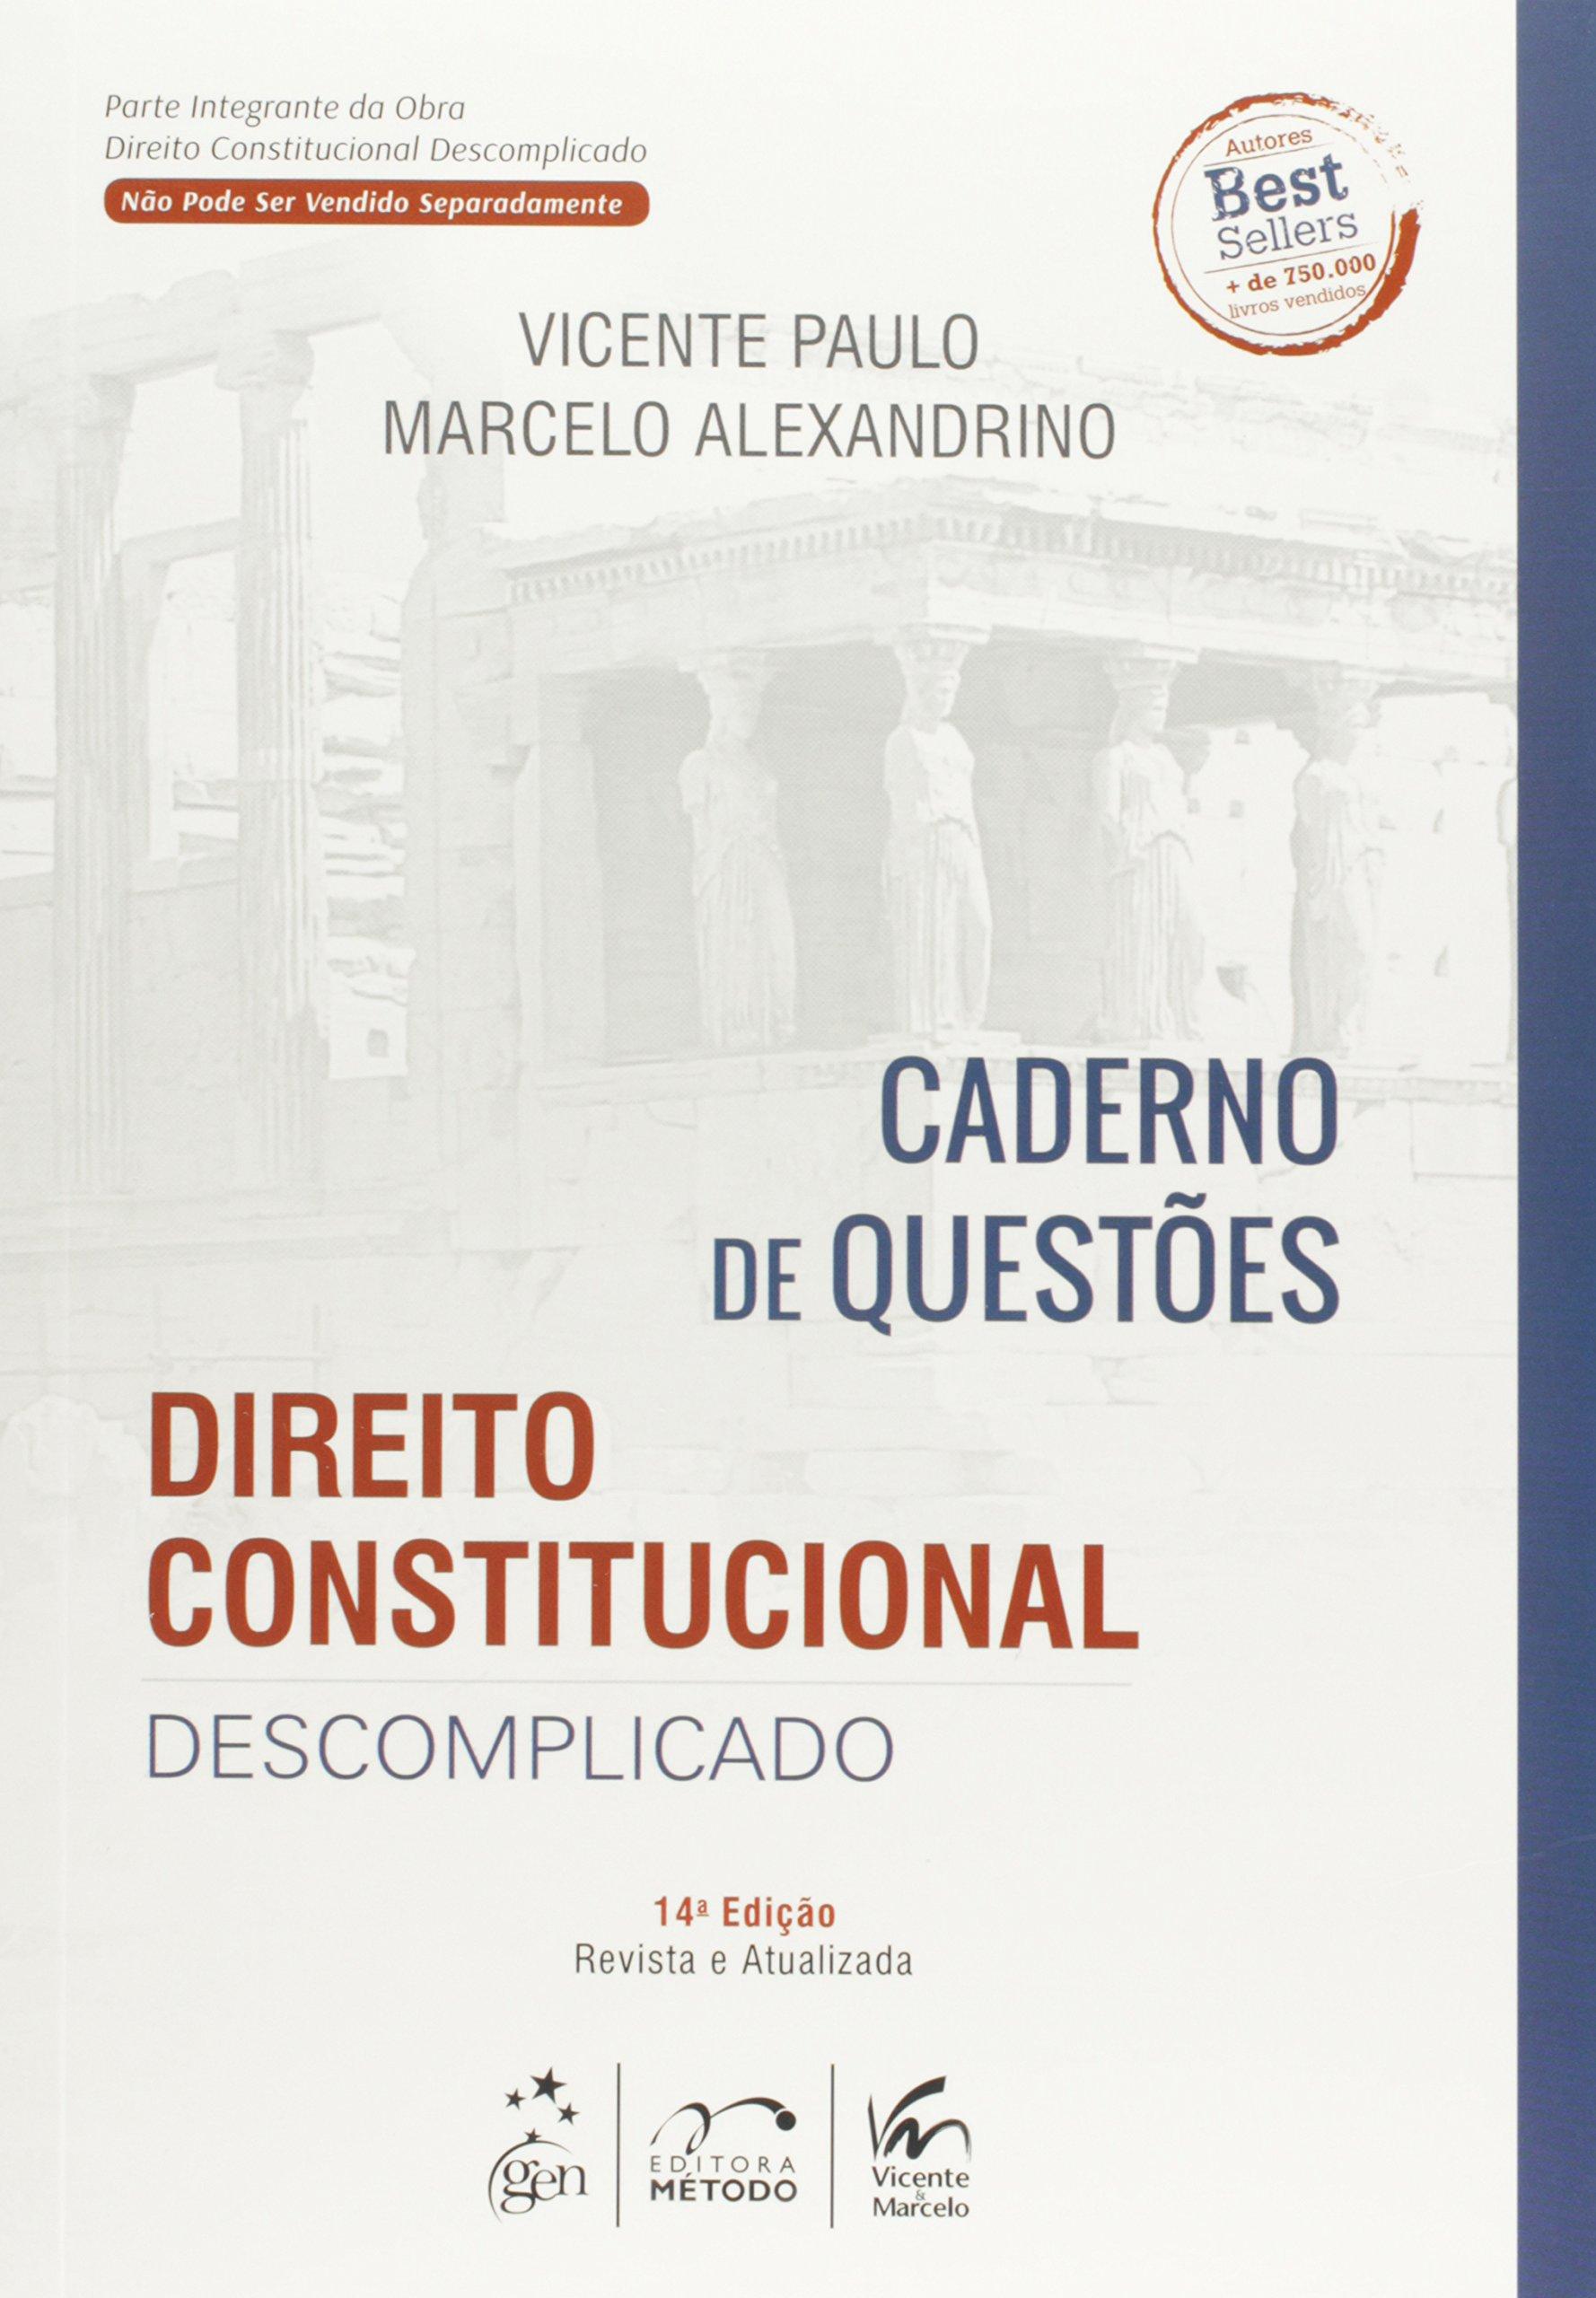 BAIXAR VICENTE DIREITO DESCOMPLICADO CONSTITUCIONAL PAULO